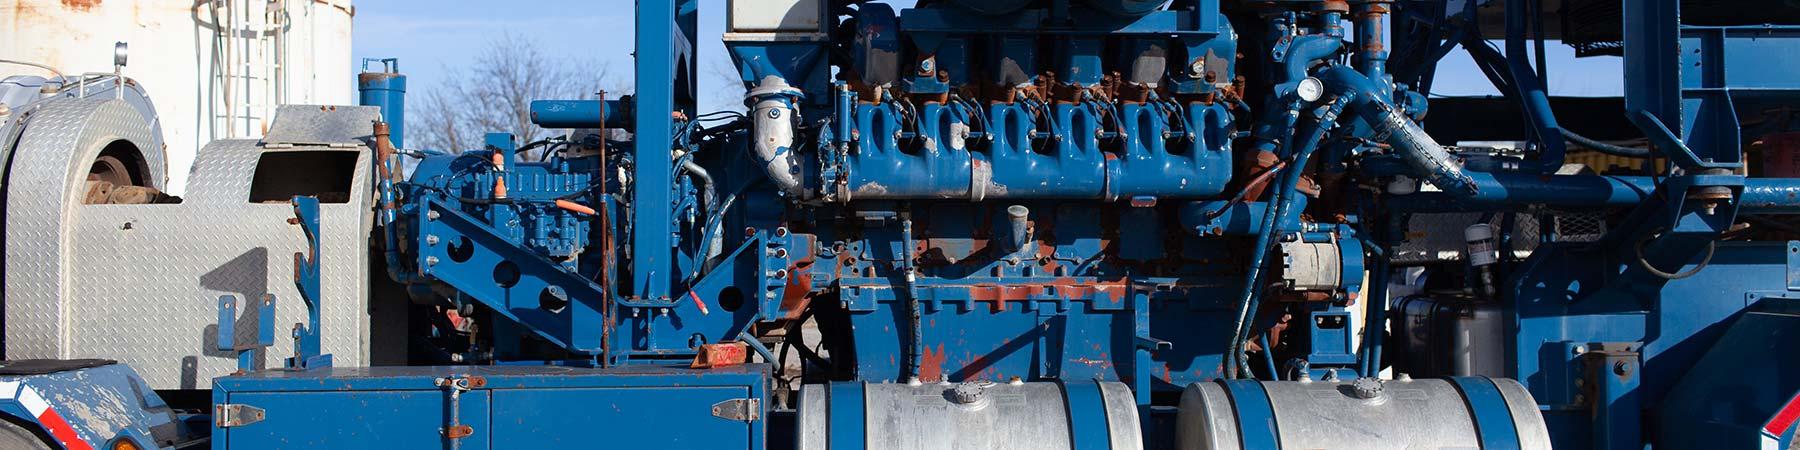 fleet service of tulsa oilfield test pit equipment testing